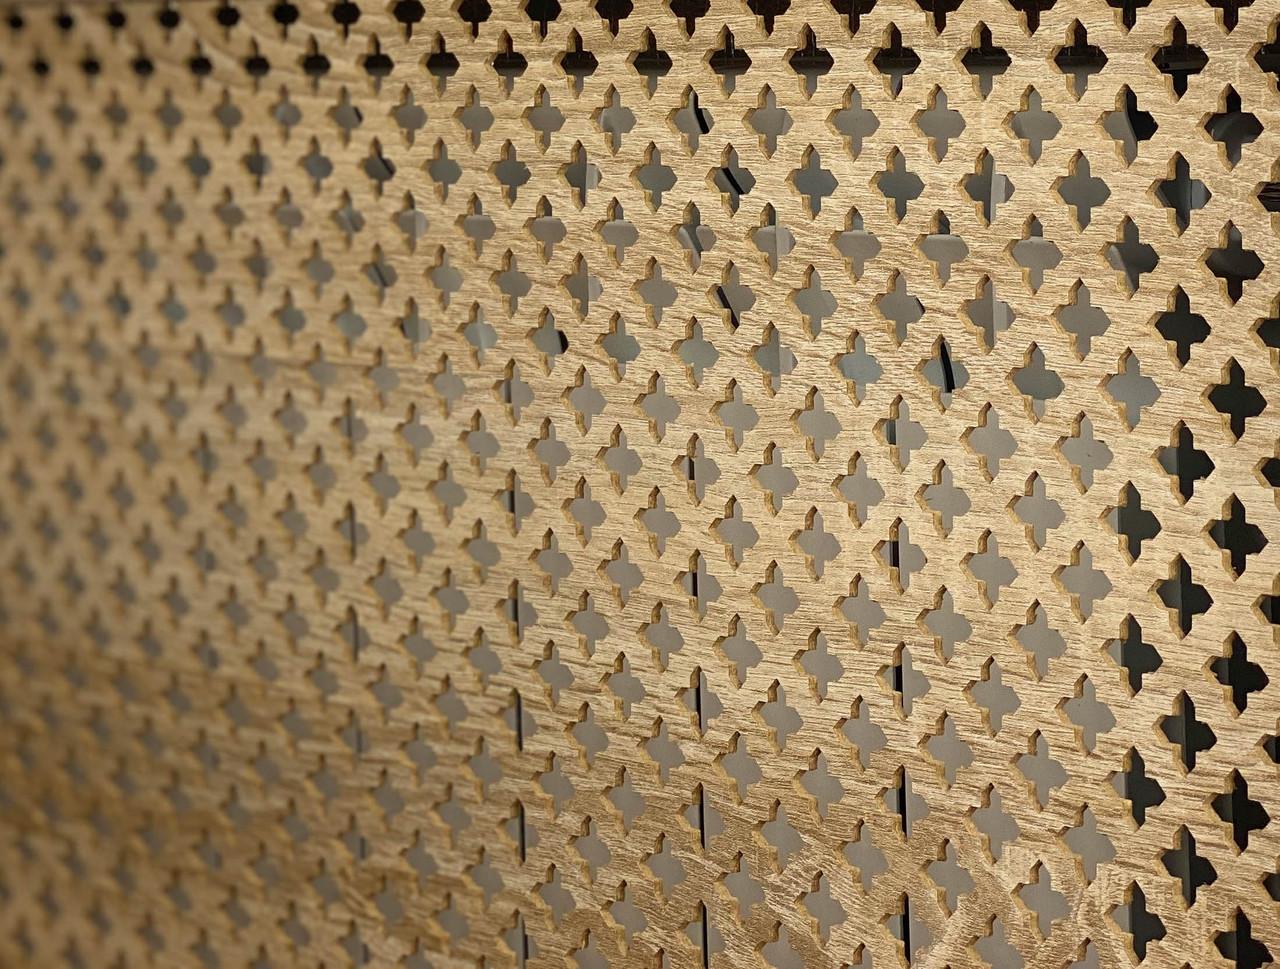 Панель (решетка) декоративная перфорированная, 1390 мм х 680 мм Роял, Дуб Сонома